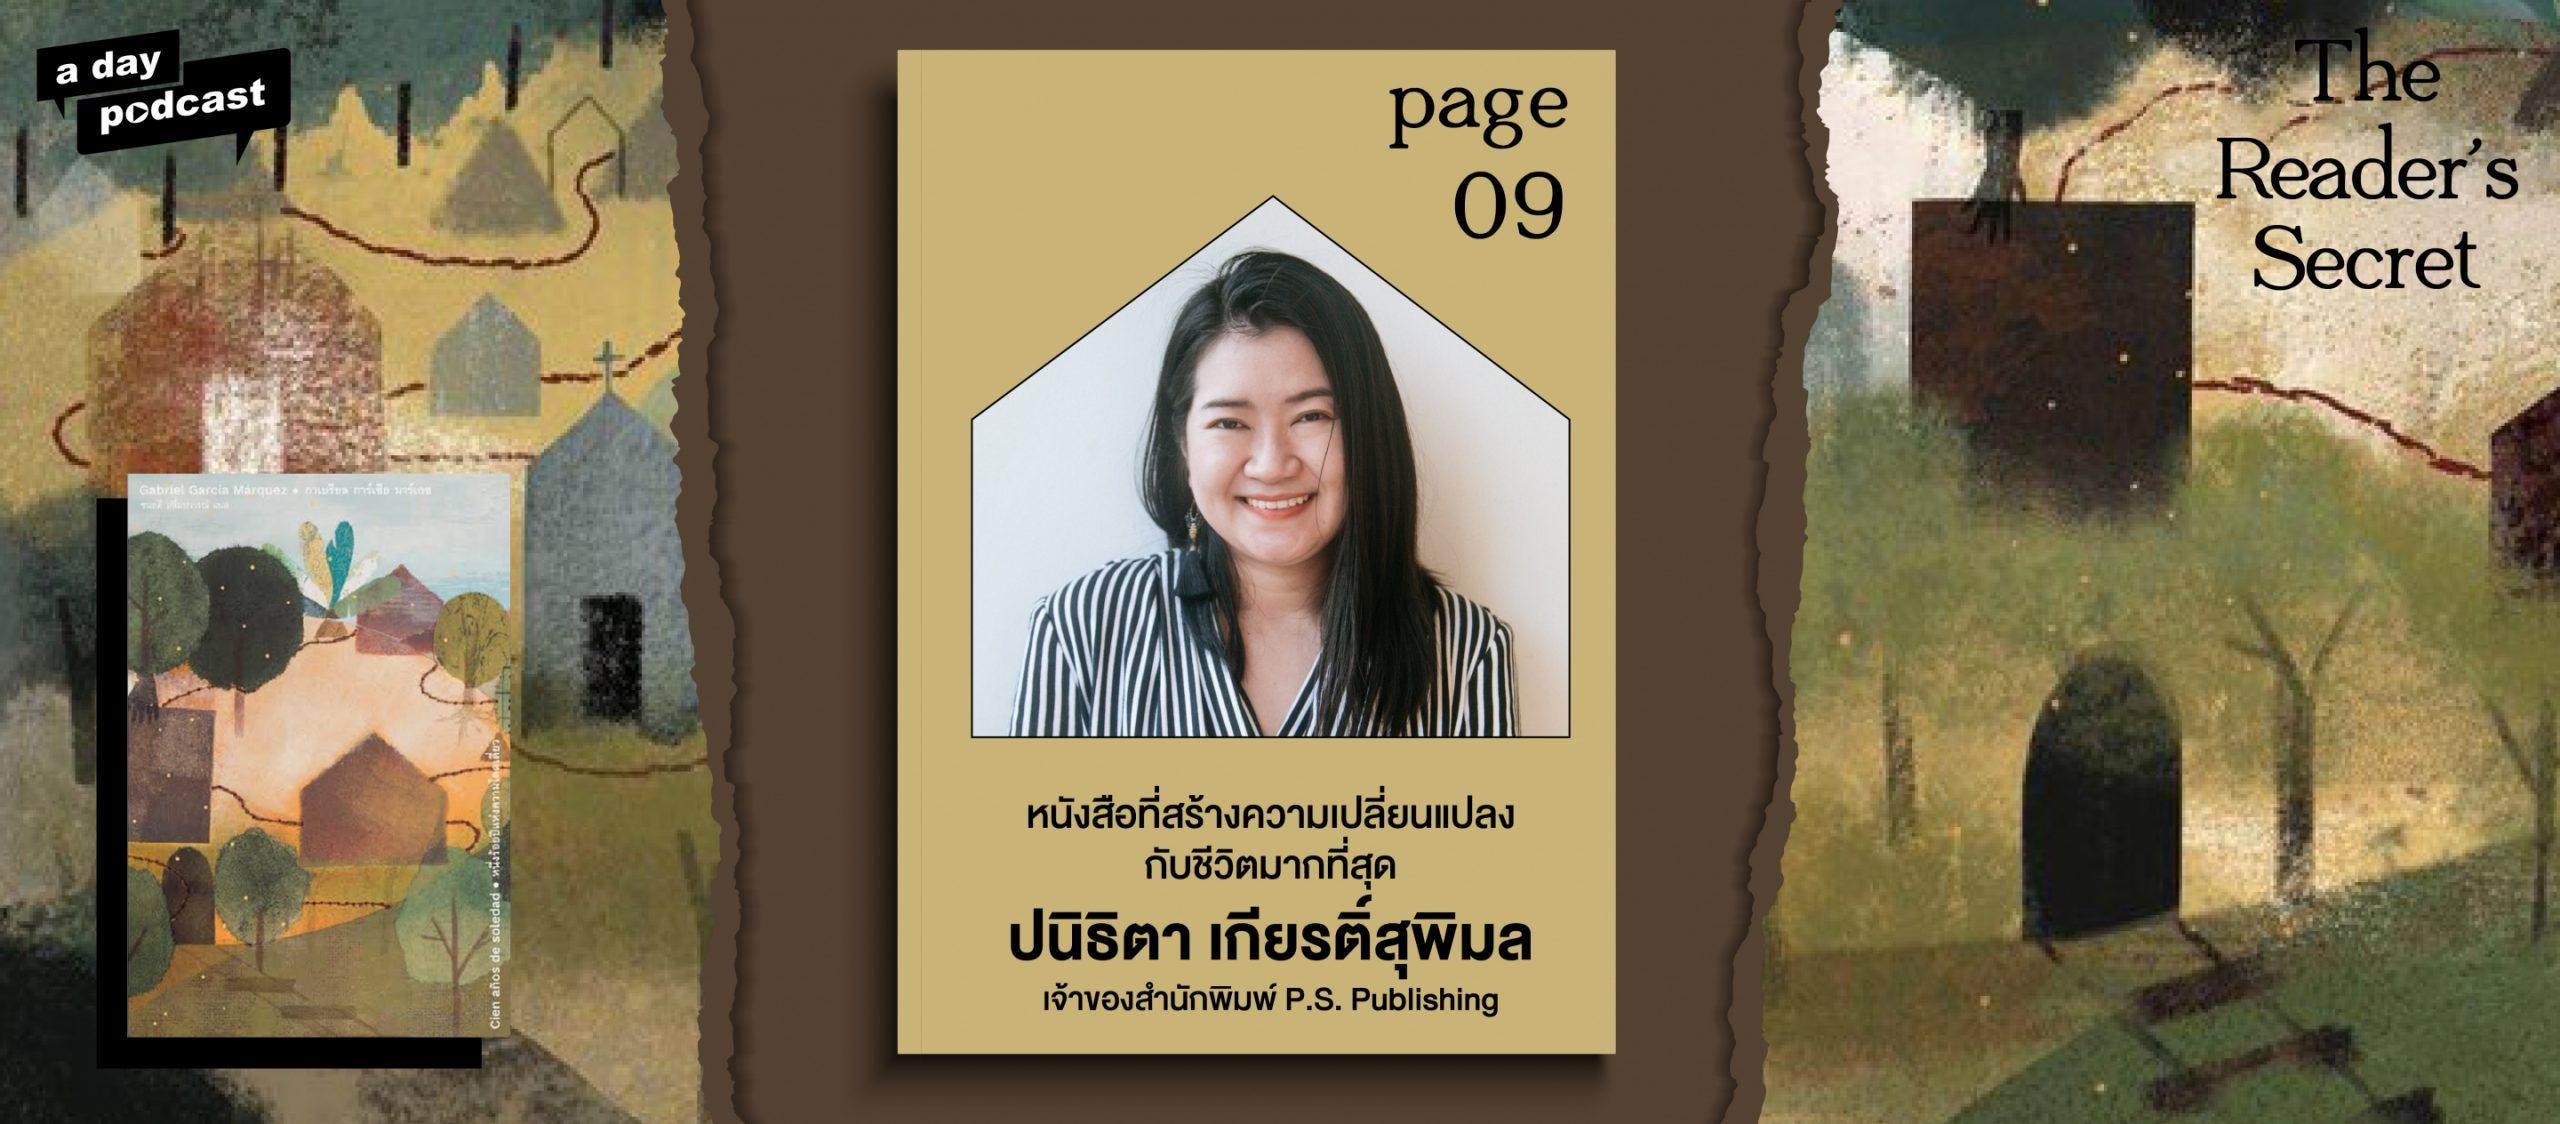 The Reader's Secret EP.09 หนังสือที่สร้างความเปลี่ยนแปลงให้ จุ๋ม P.S. Publishing